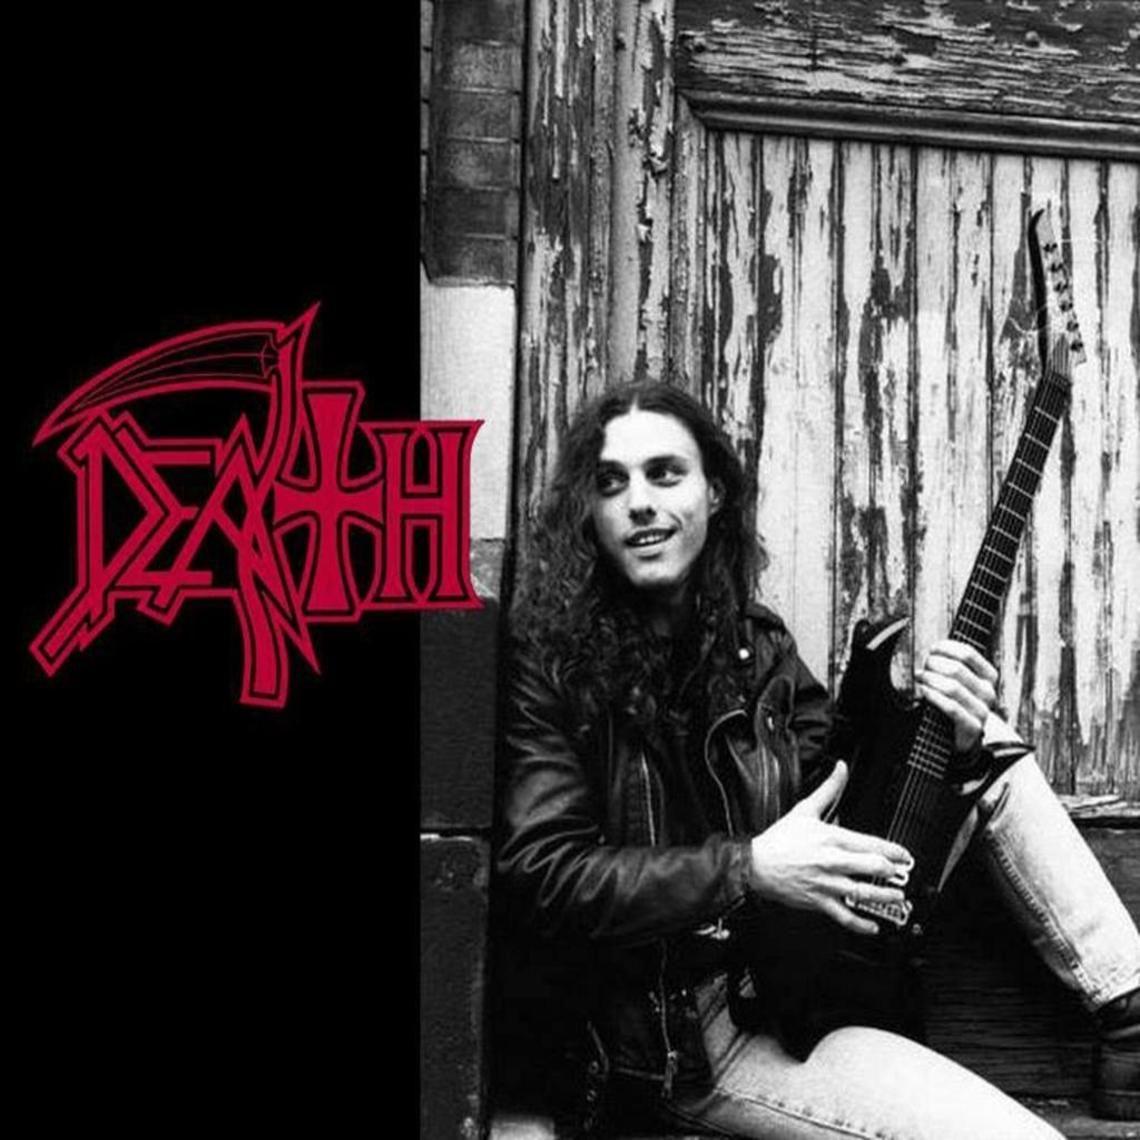 Chuck #Schuldiner (1967-2001) founder, singer and guitarist of #Death